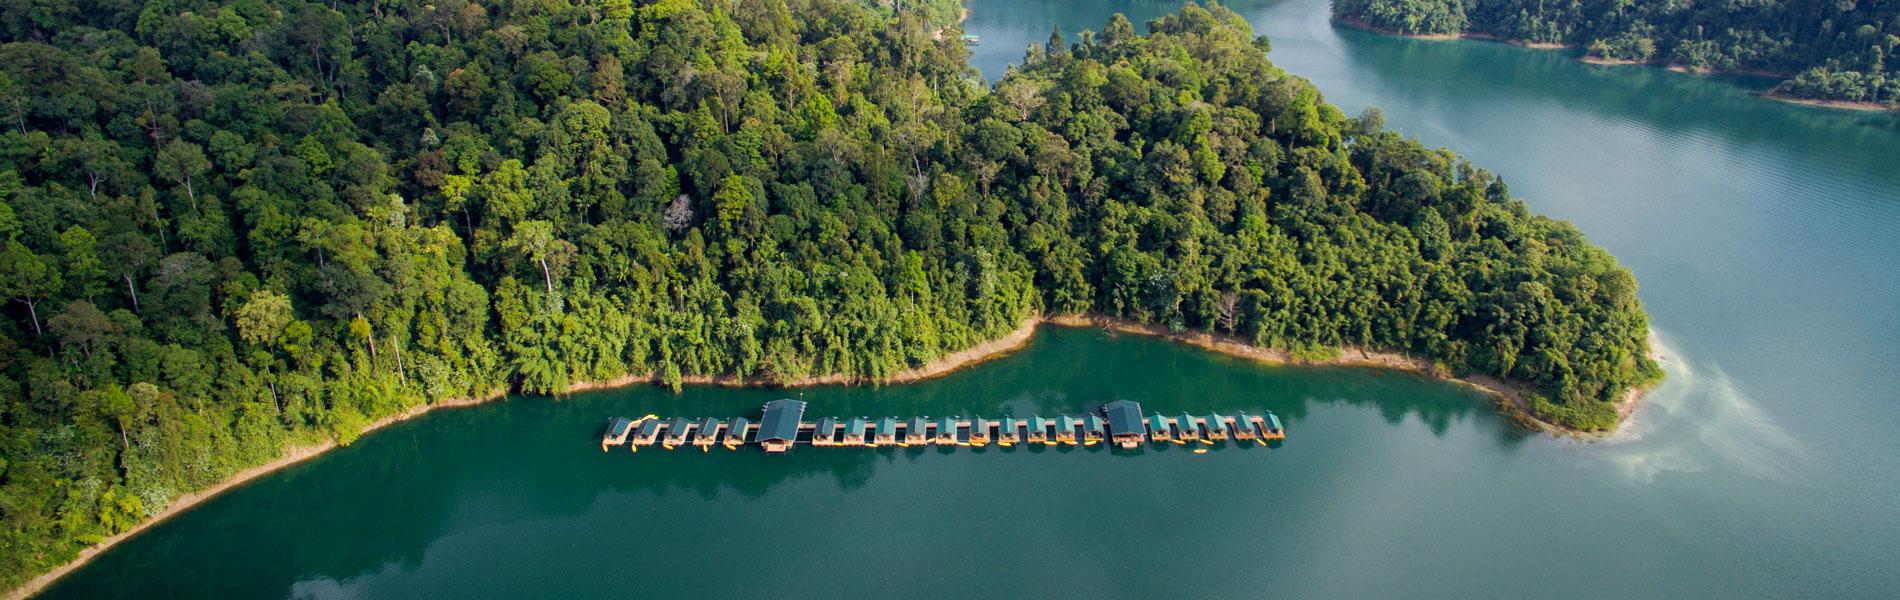 Rainforest Camp Lake